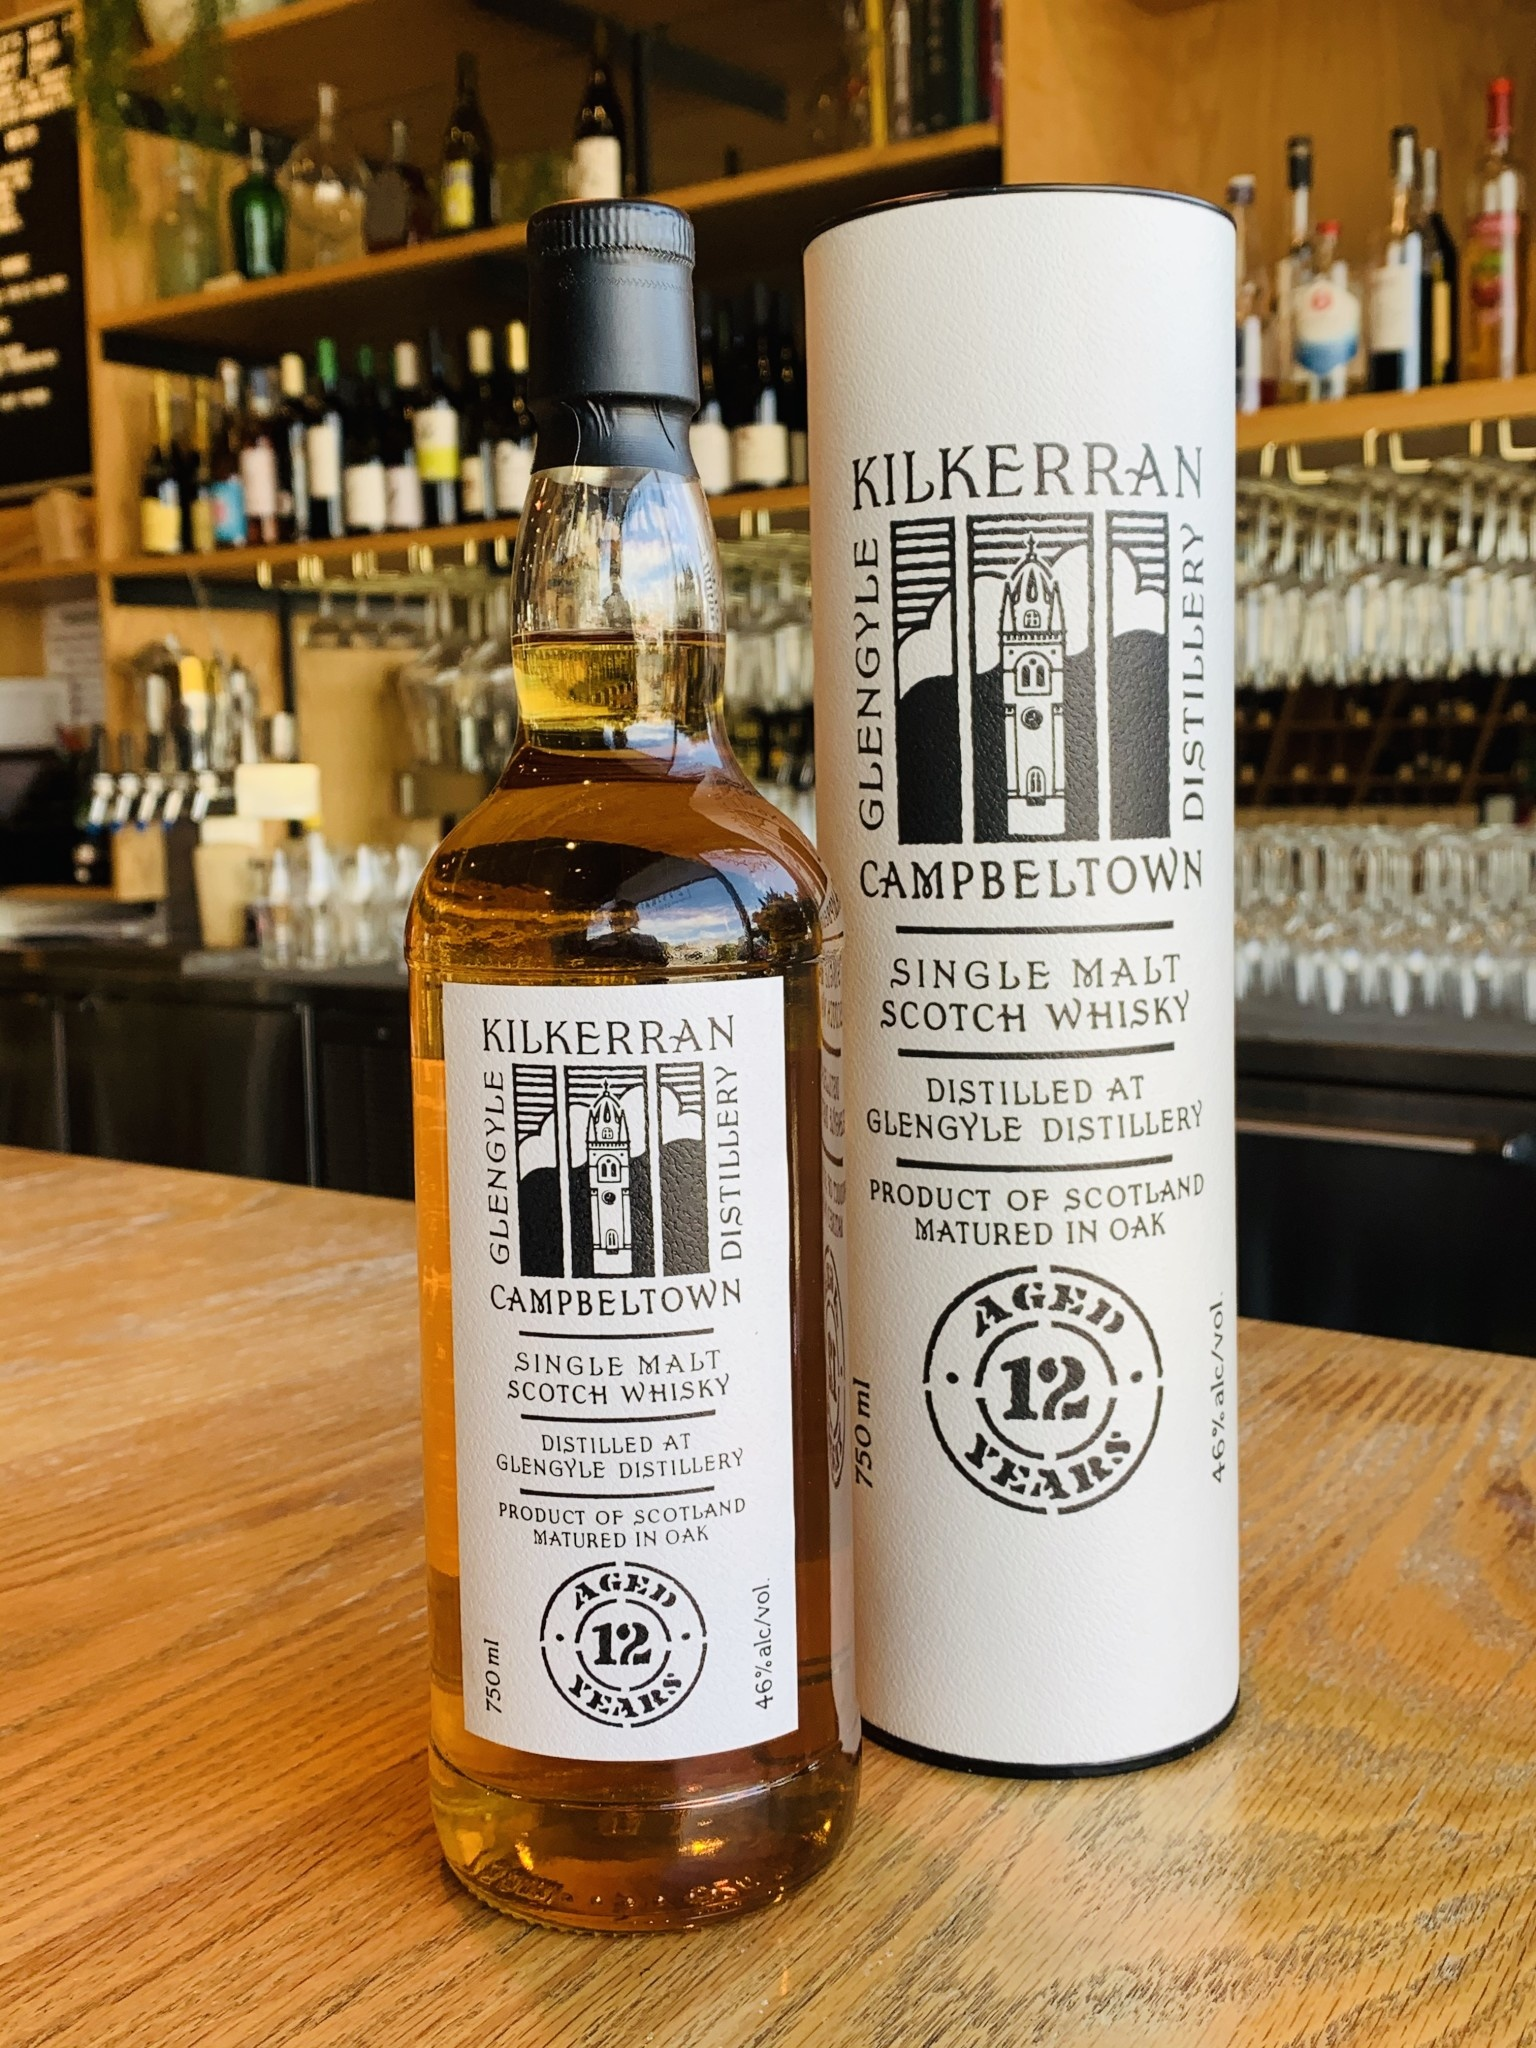 Glengyle Distillery Glengyle Distillery Kilkerran Campbeltown Single Malt Scotch 12yr 750ml